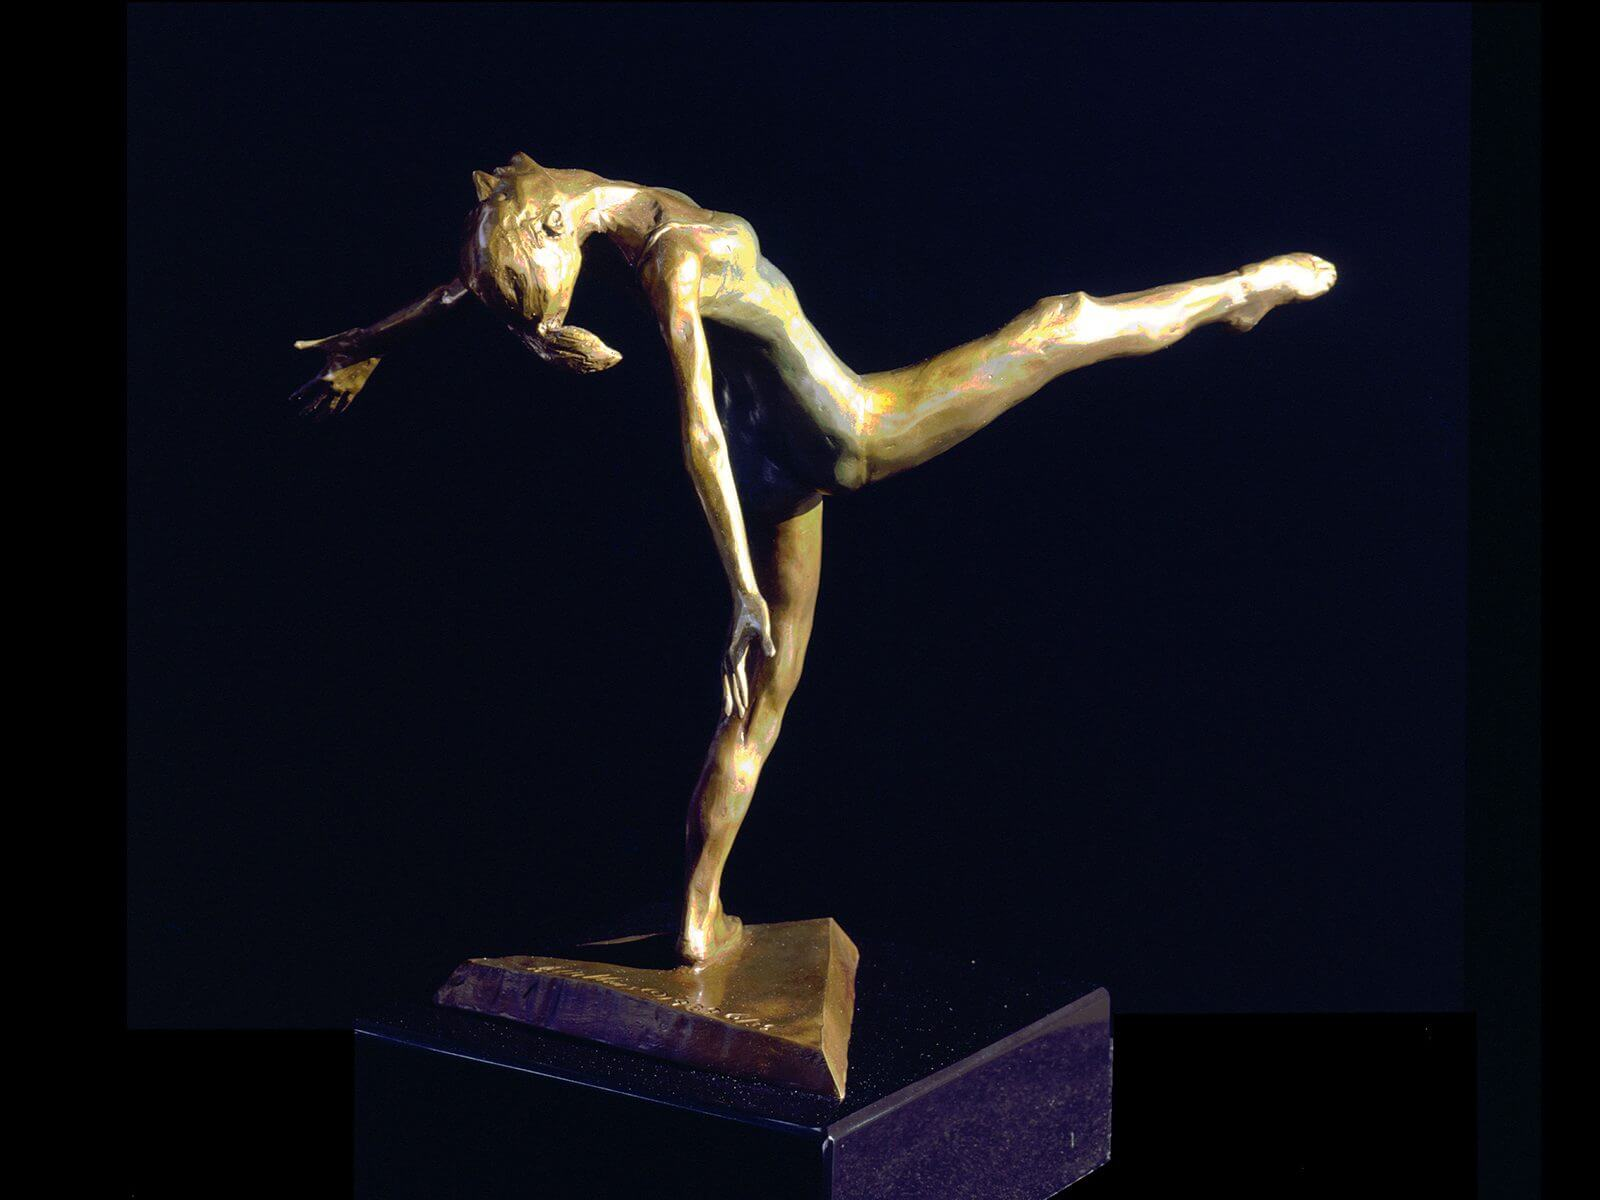 Modern Dancer a medium size bronze modern dancer figurative sculpture by Andrew DeVries